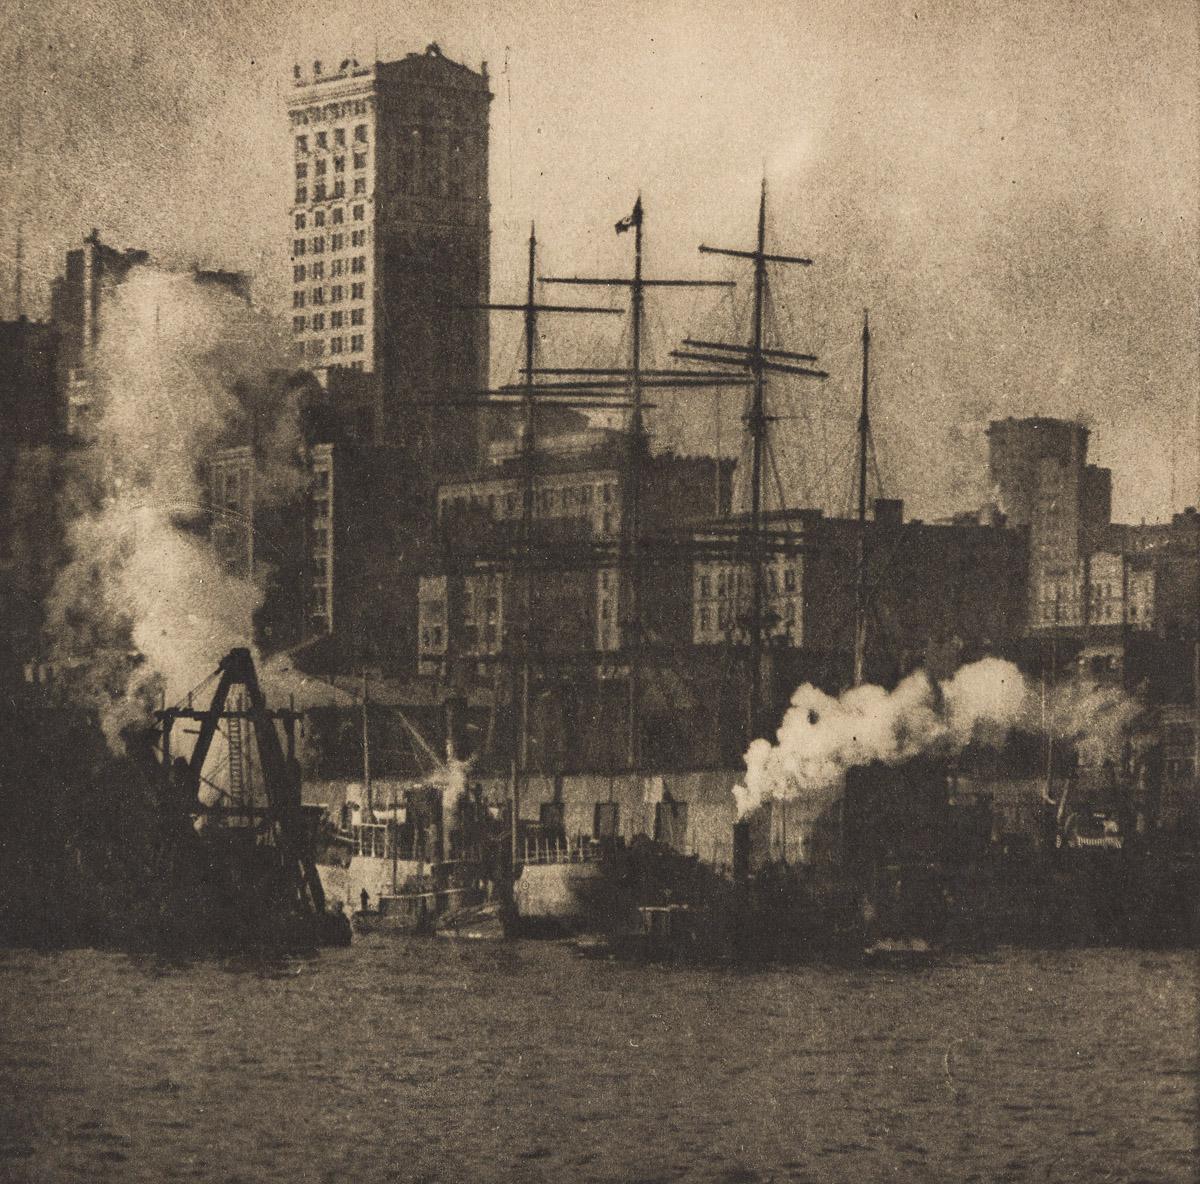 ALVIN LANGDON COBURN (1882-1996) The Unfinished Bridge * The Waterfront.